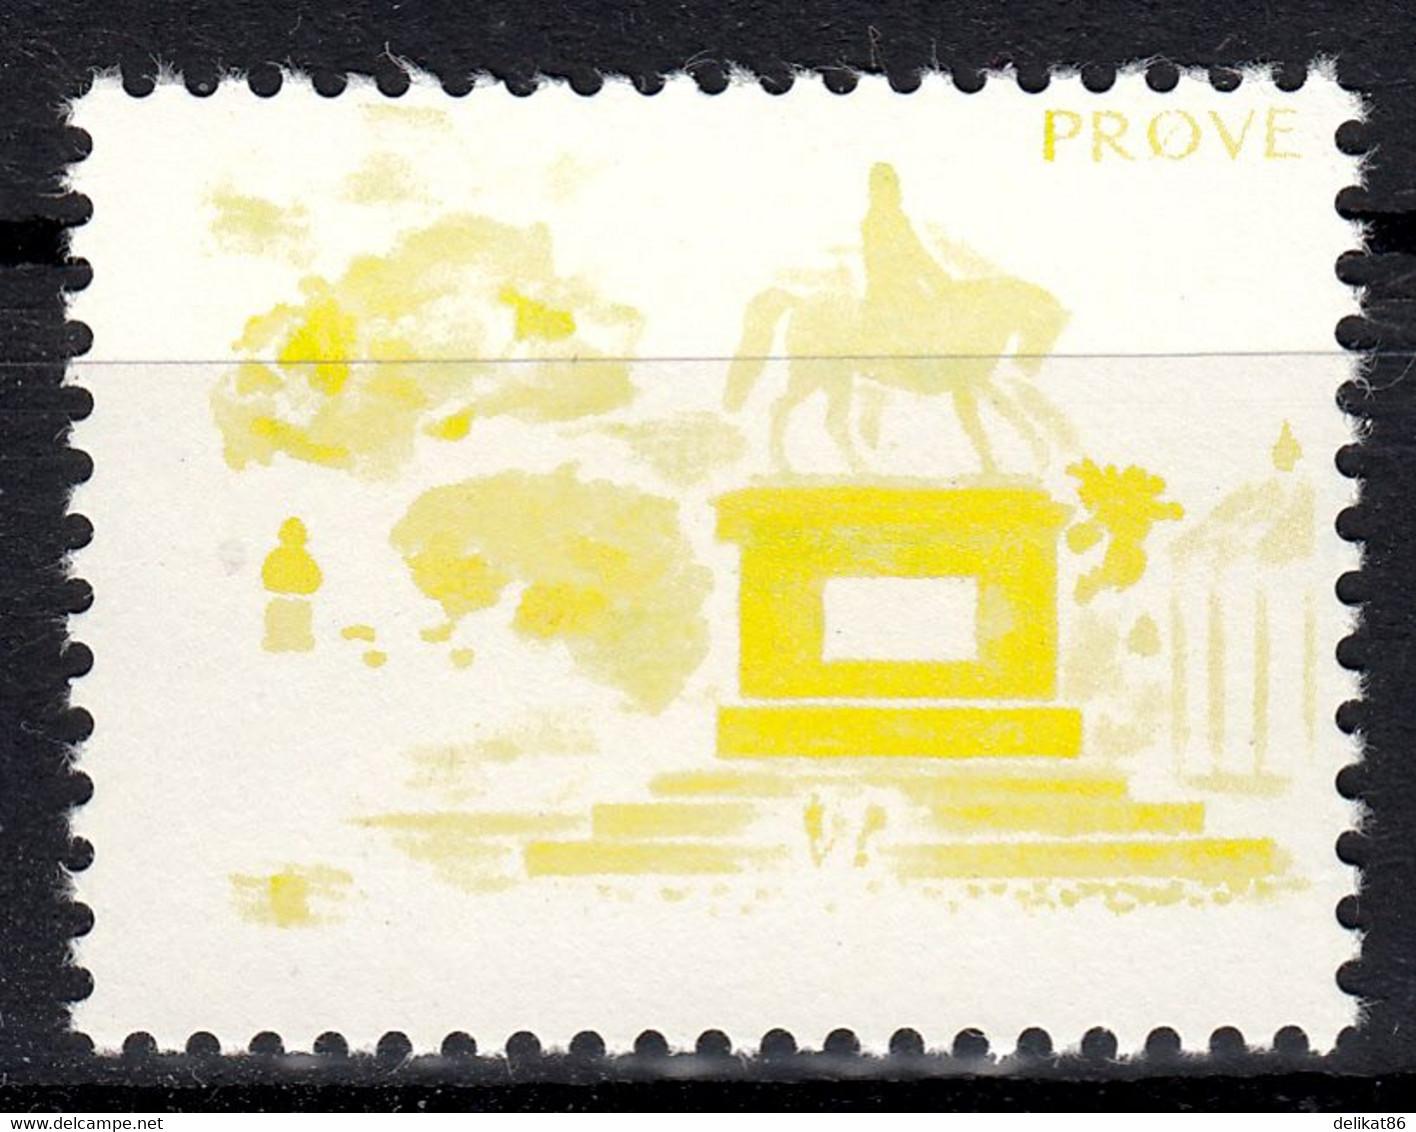 Test Stamp, Specimen, Prove, Probedruck, Reiterstandbild, Slania 1980 - 1985,  18 Stück - Proofs & Reprints